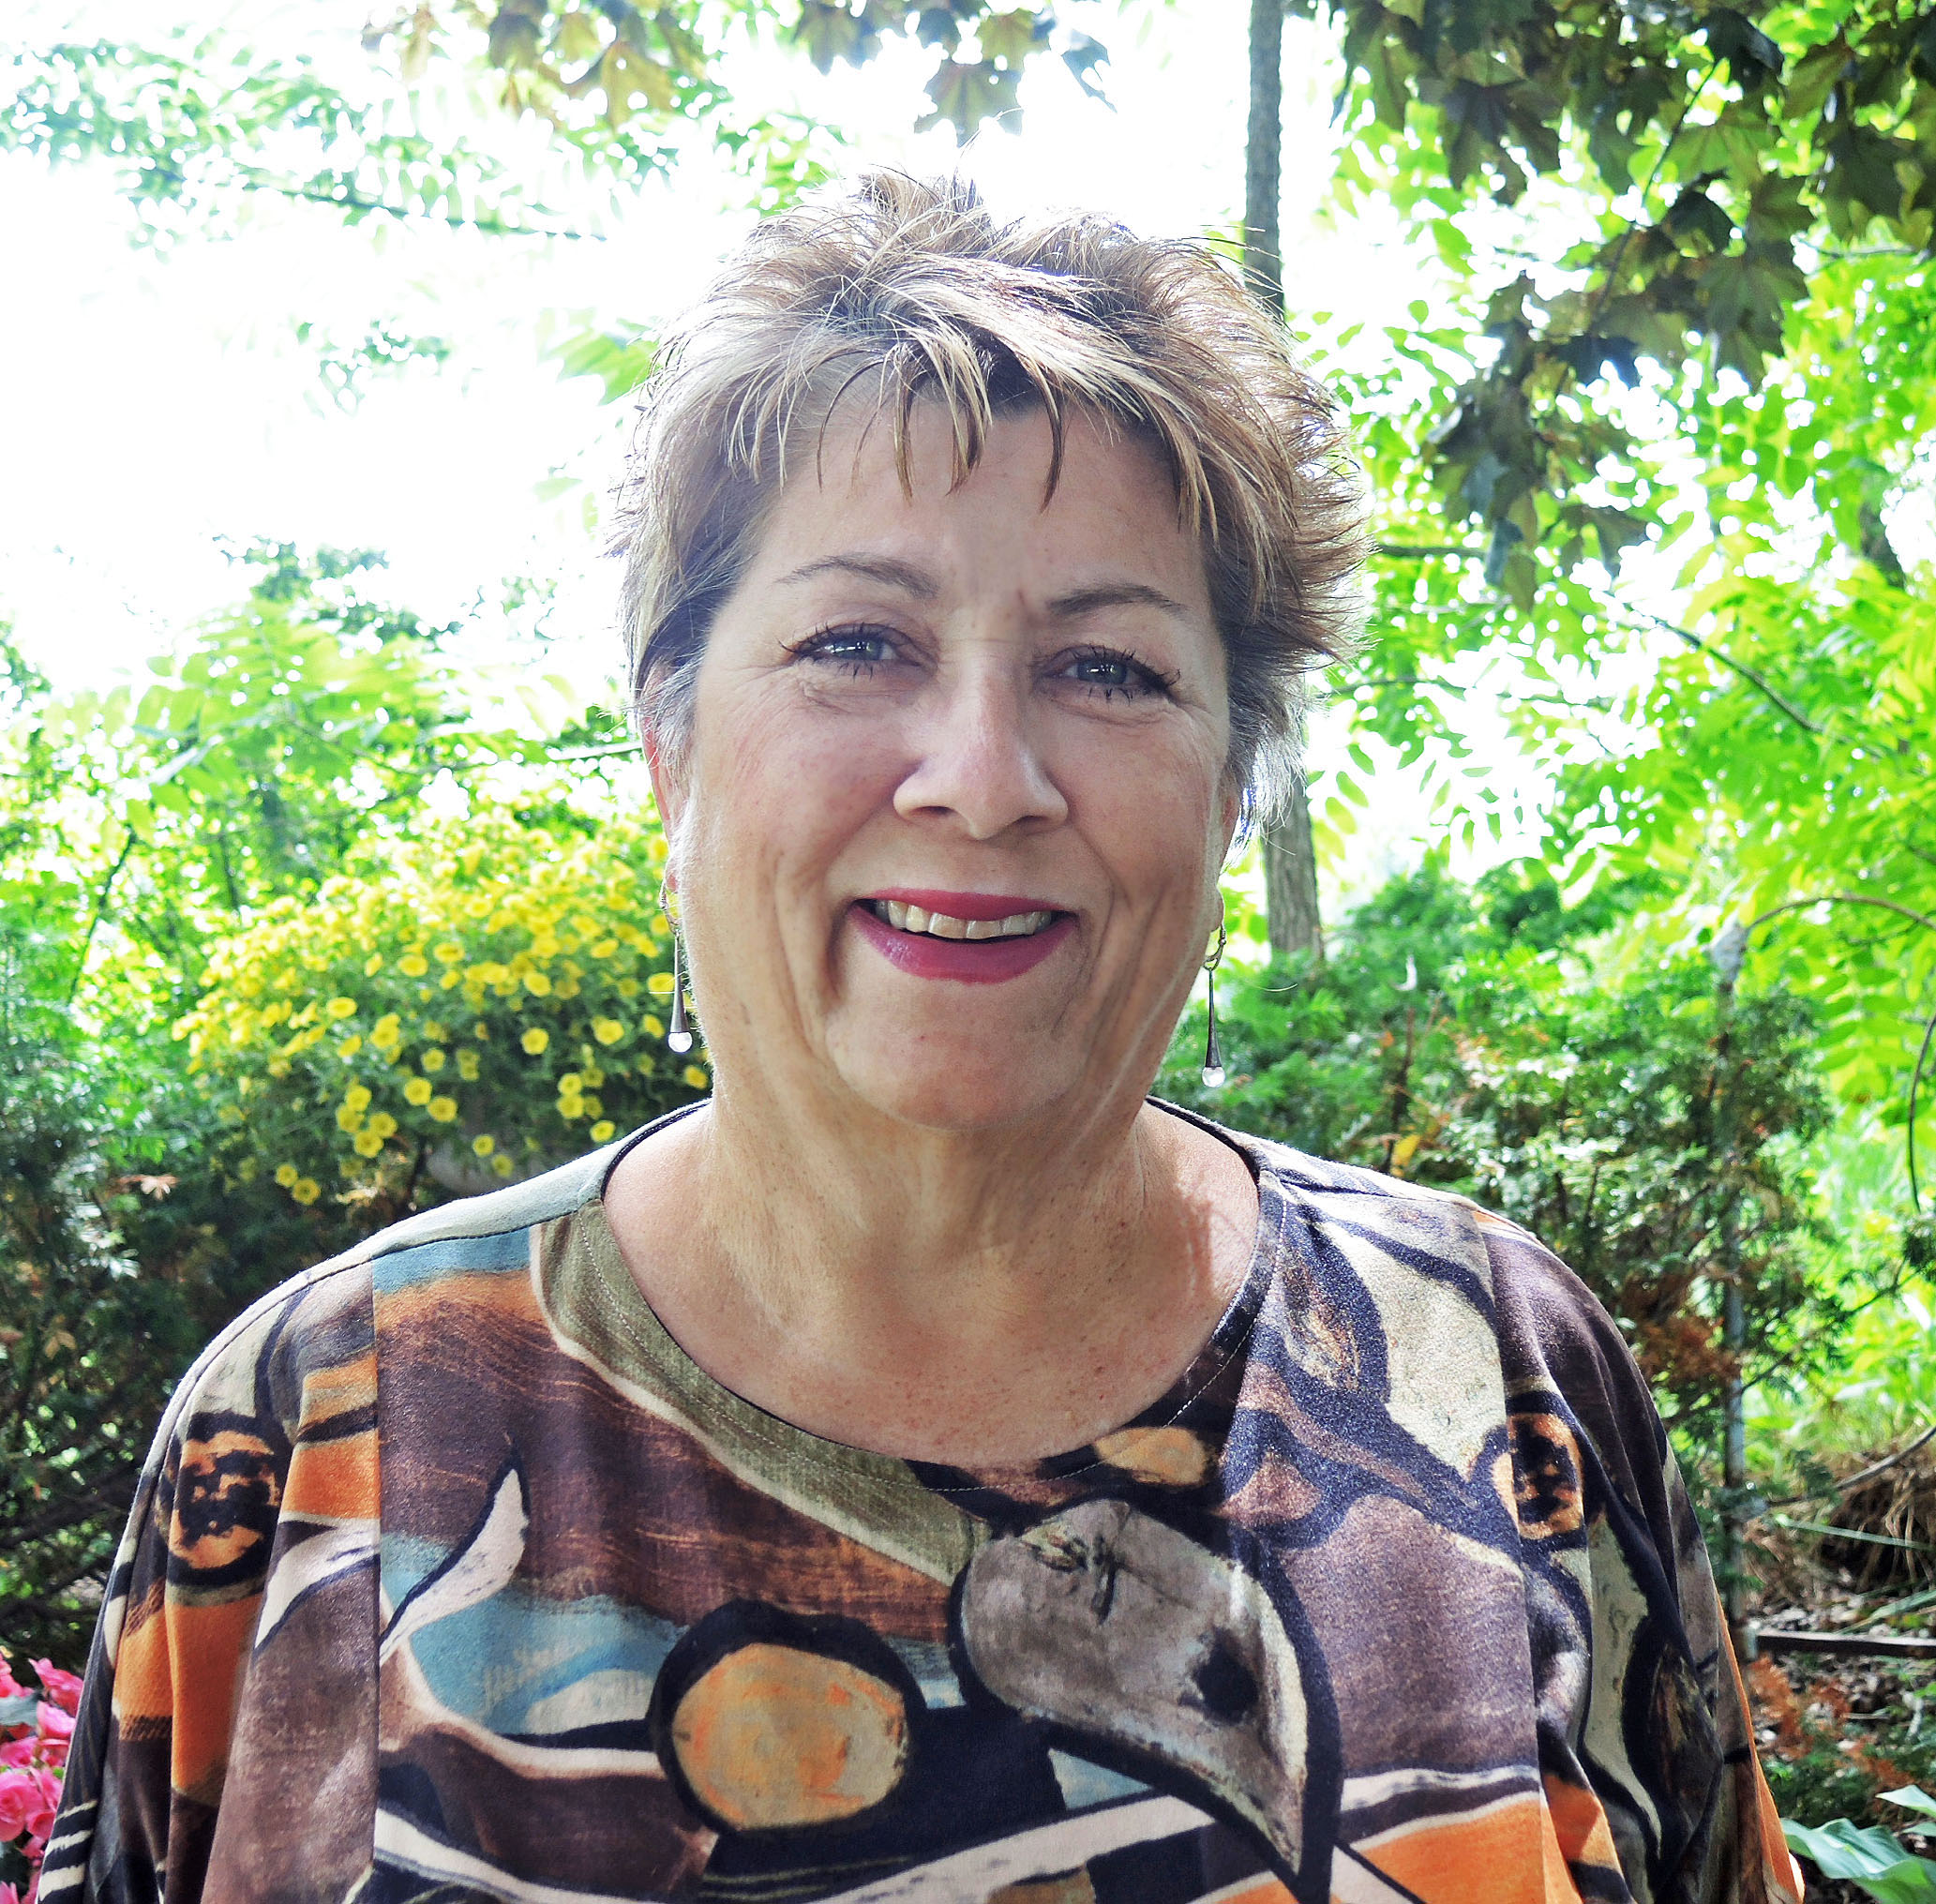 Sharon Barikmo